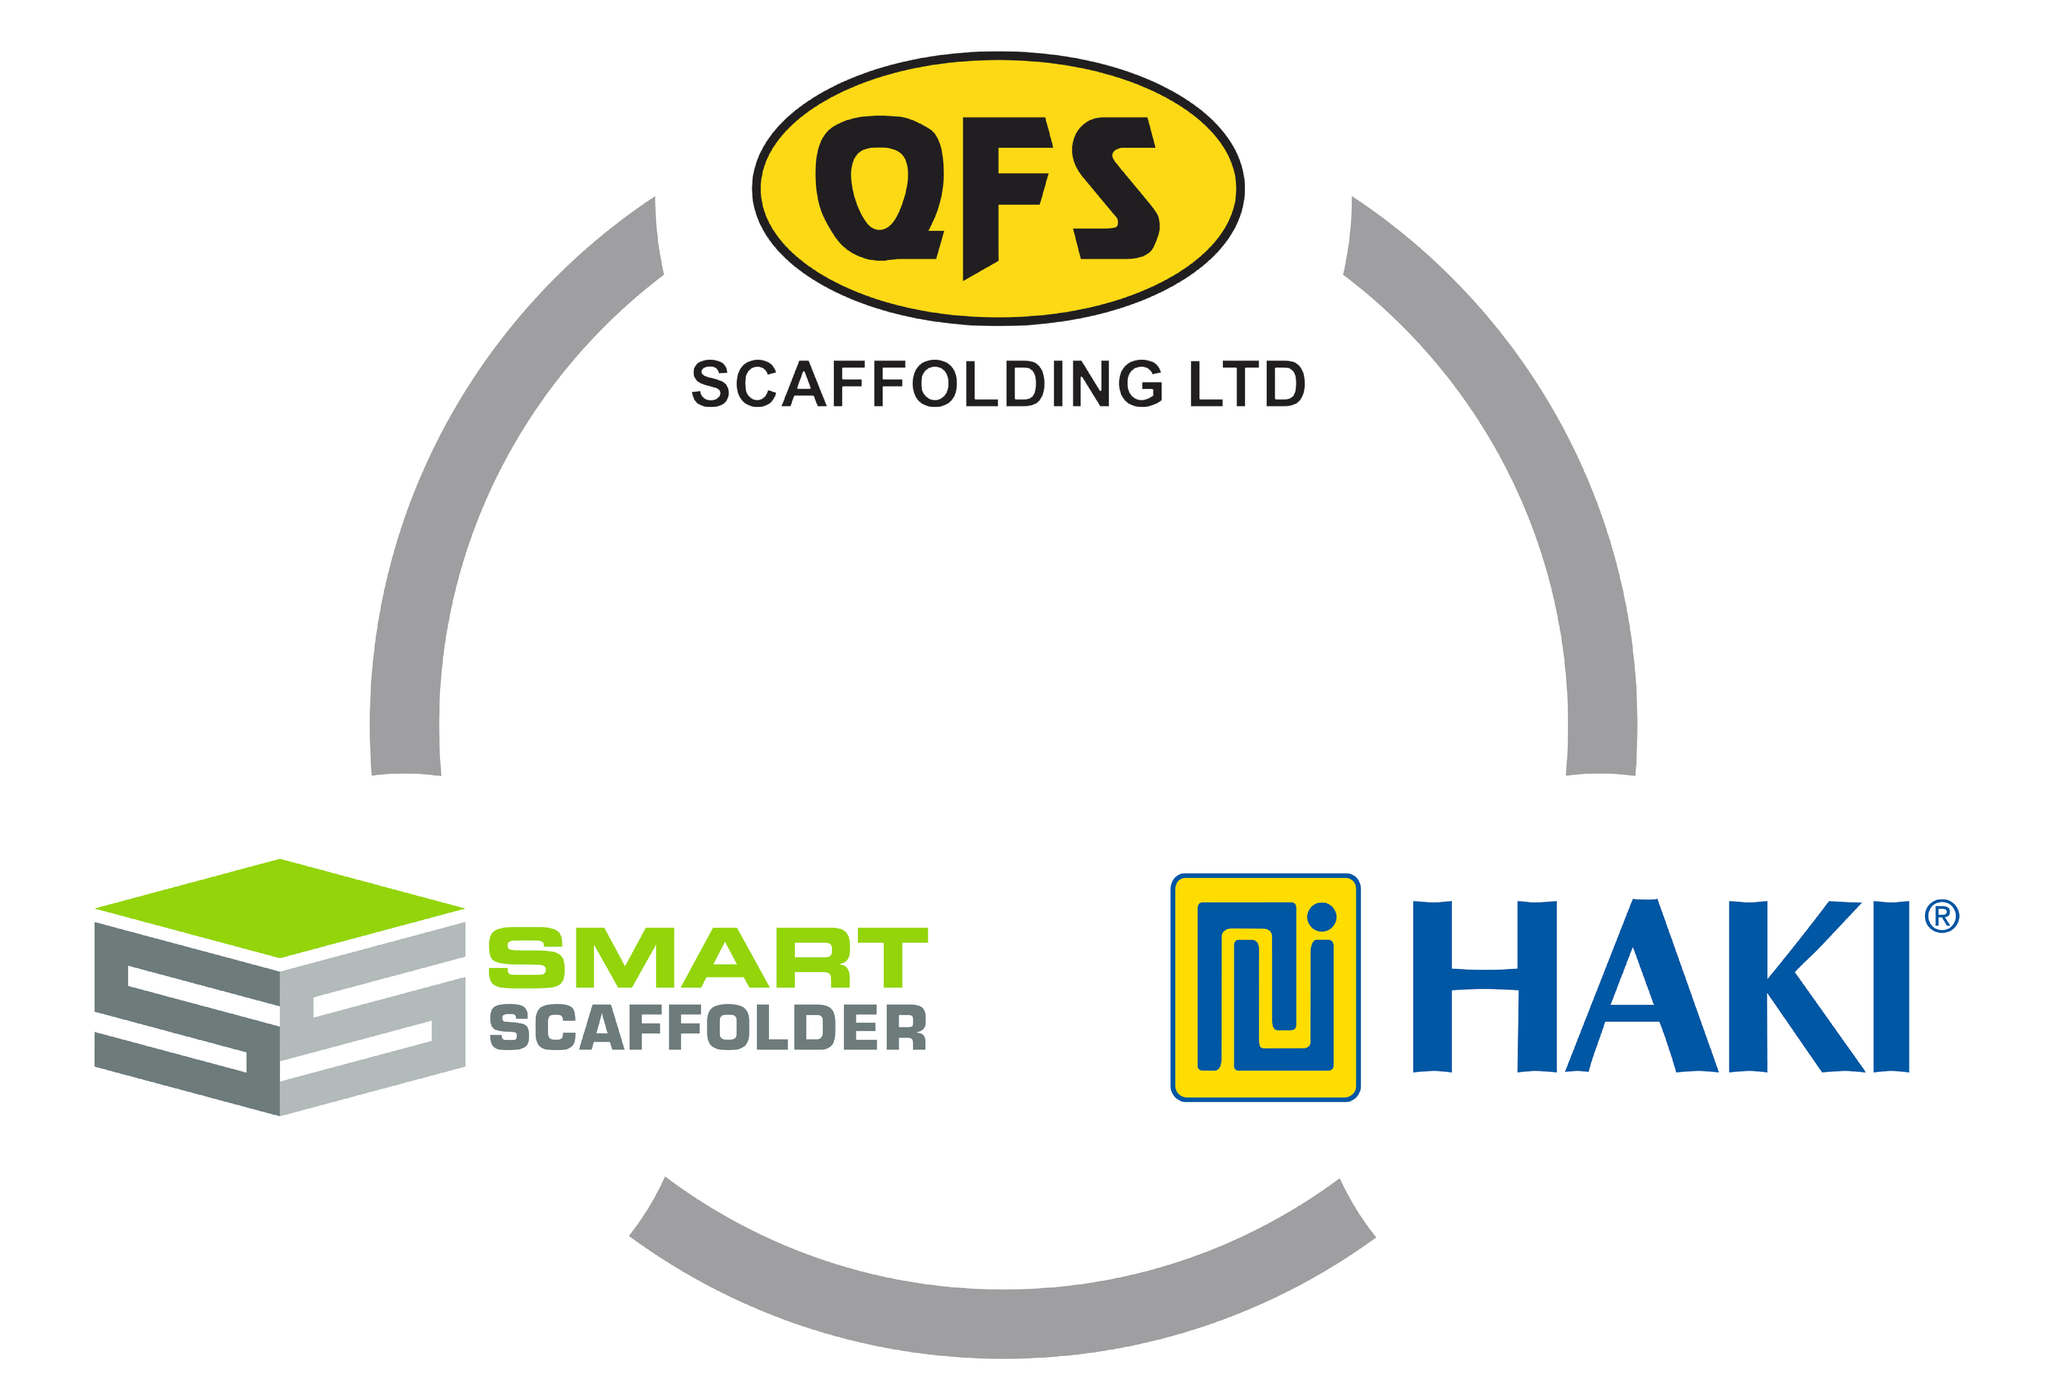 QFS Scaffolding with SMART Scaffolder